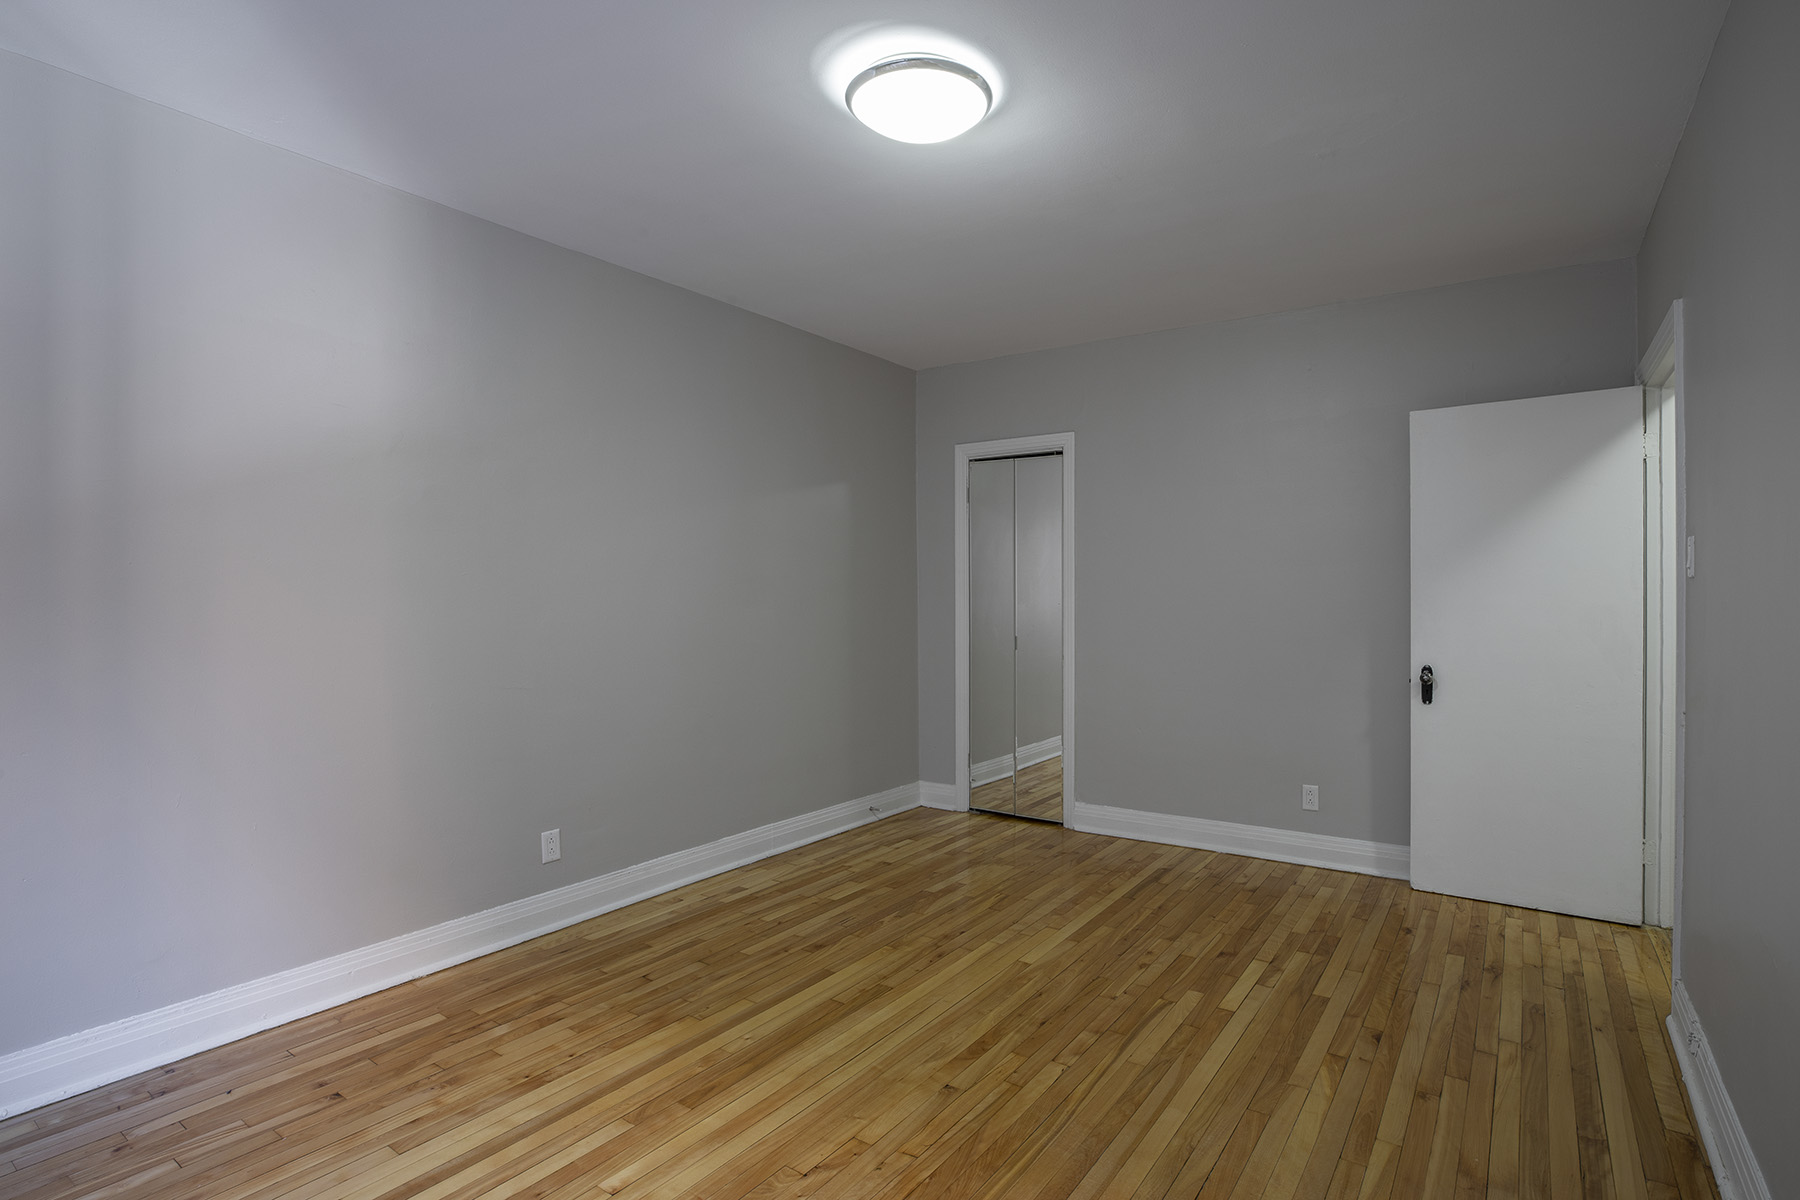 1 bedroom Apartments for rent in Cote-St-Luc at Les immeubles MacDonald - Photo 05 - RentQuebecApartments – L401535